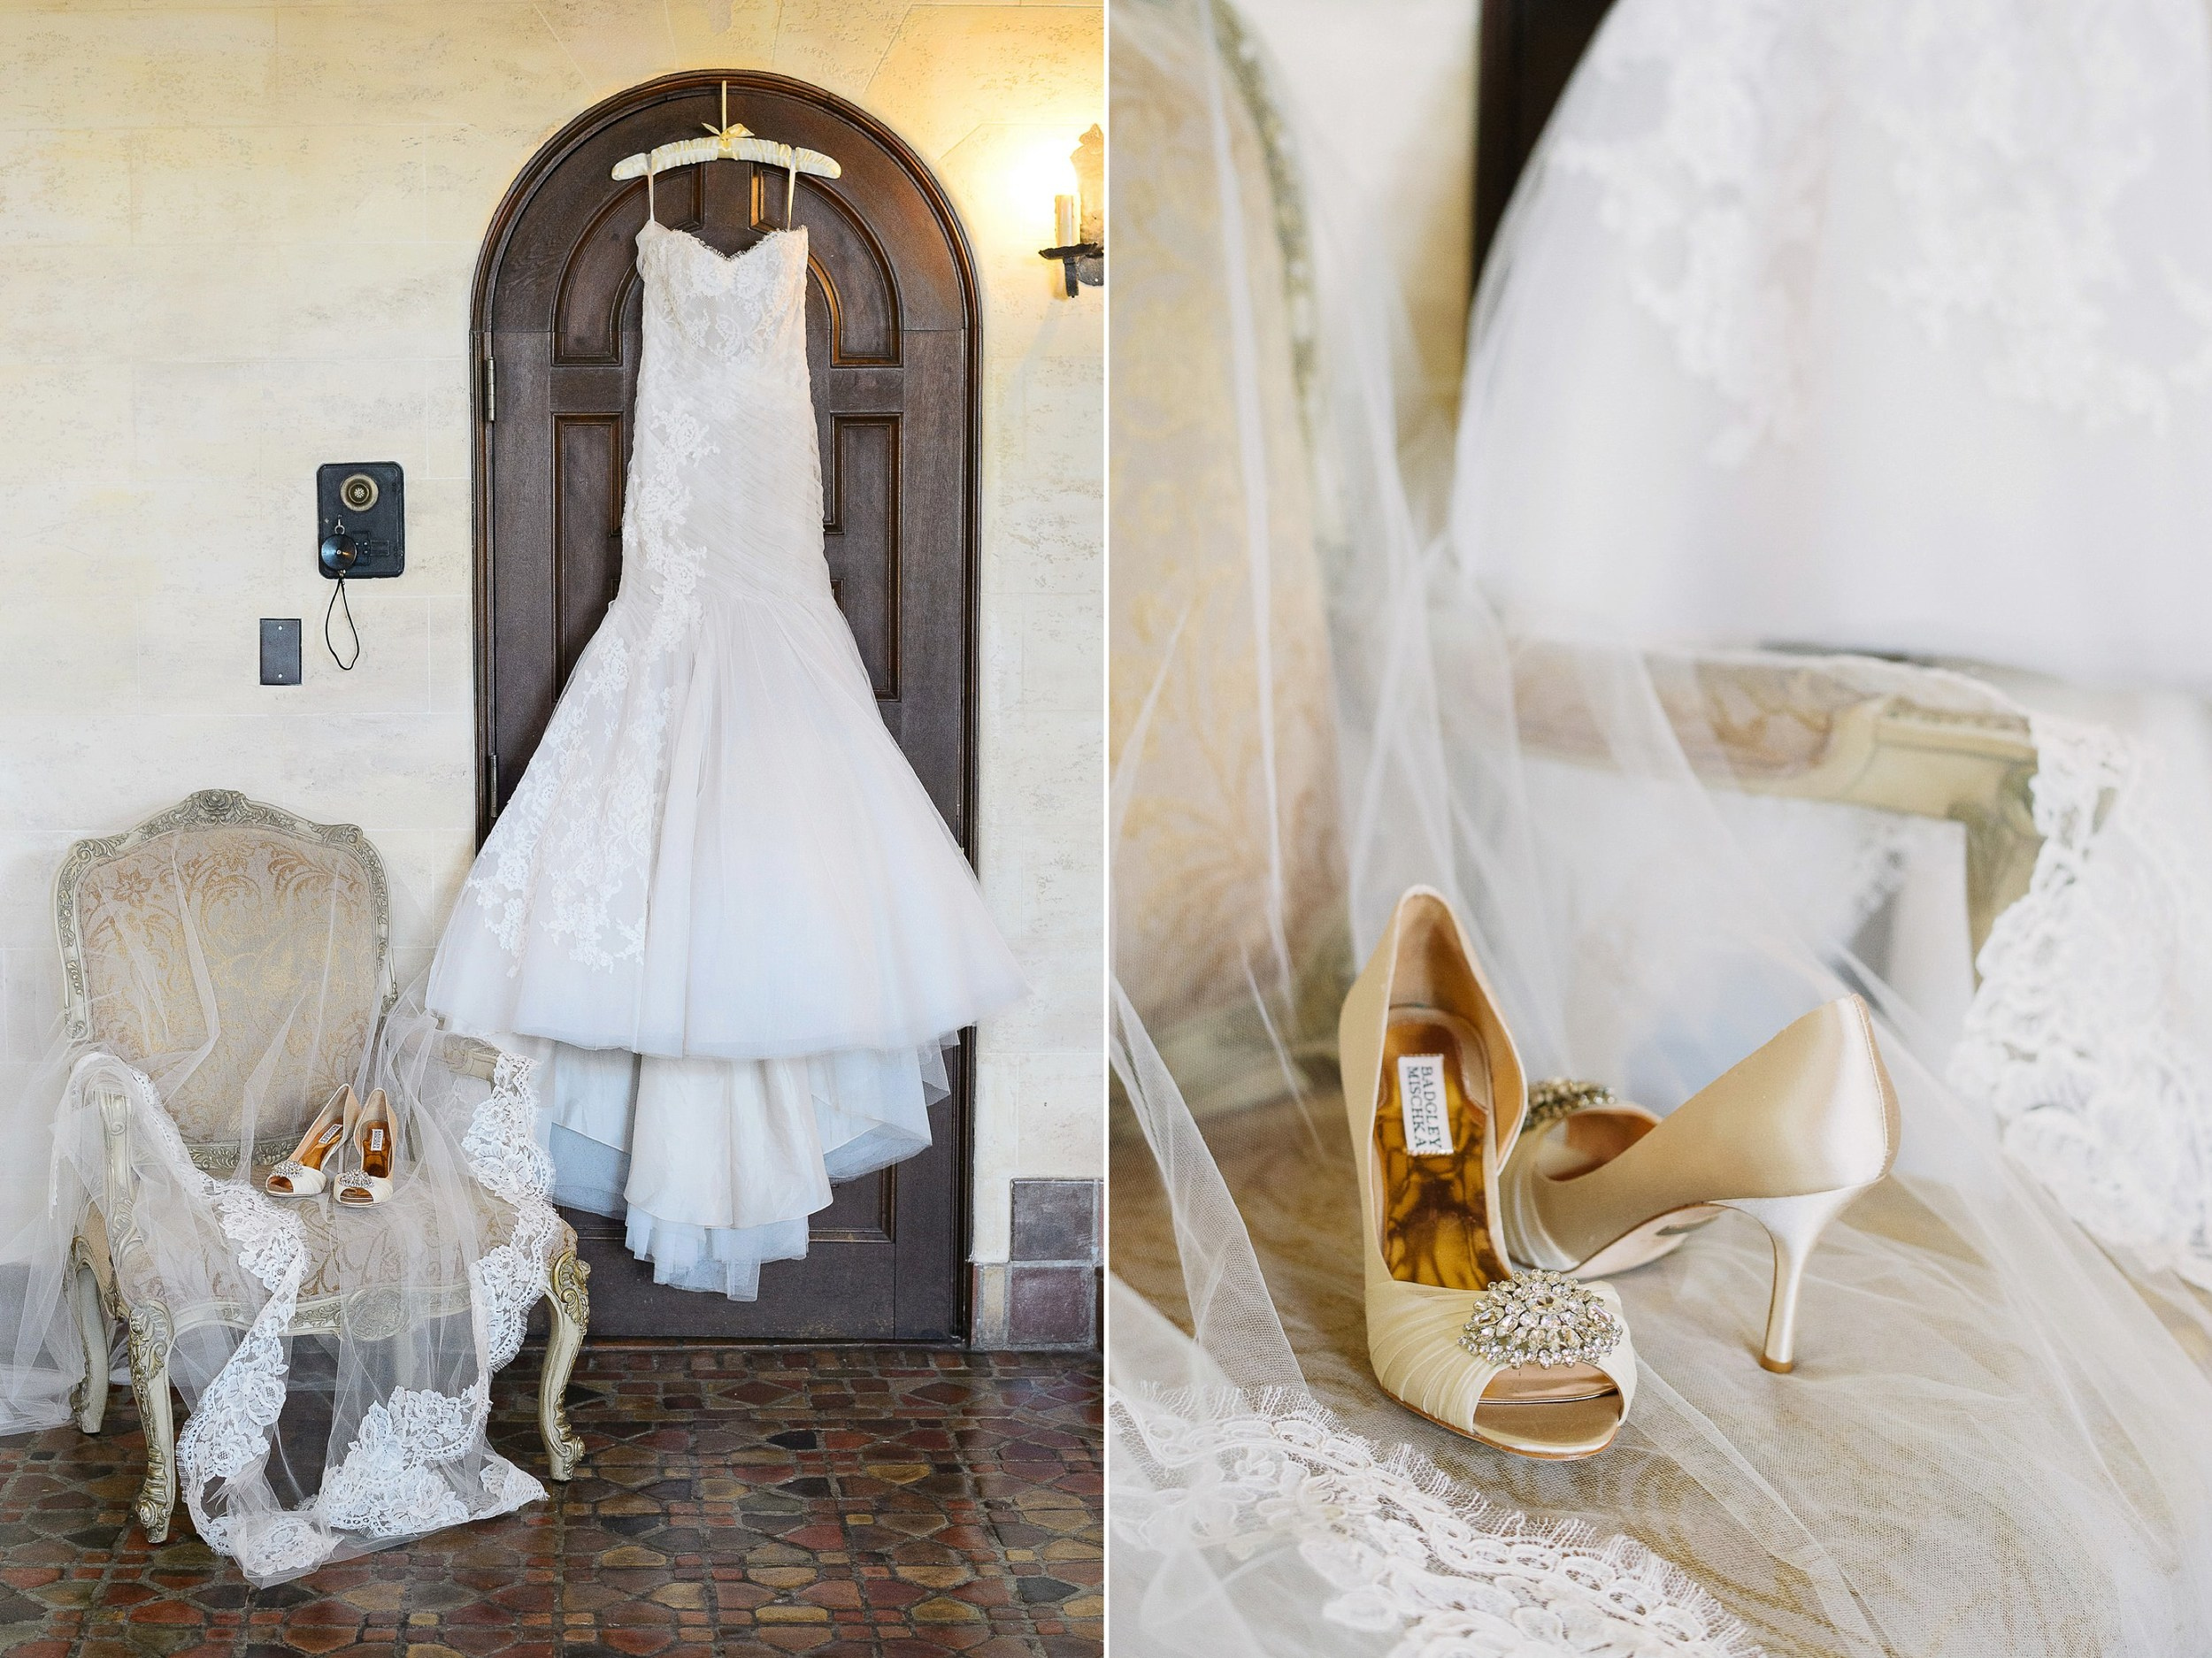 Badgley Mischka Shoes and Monique Lhuillier Dress